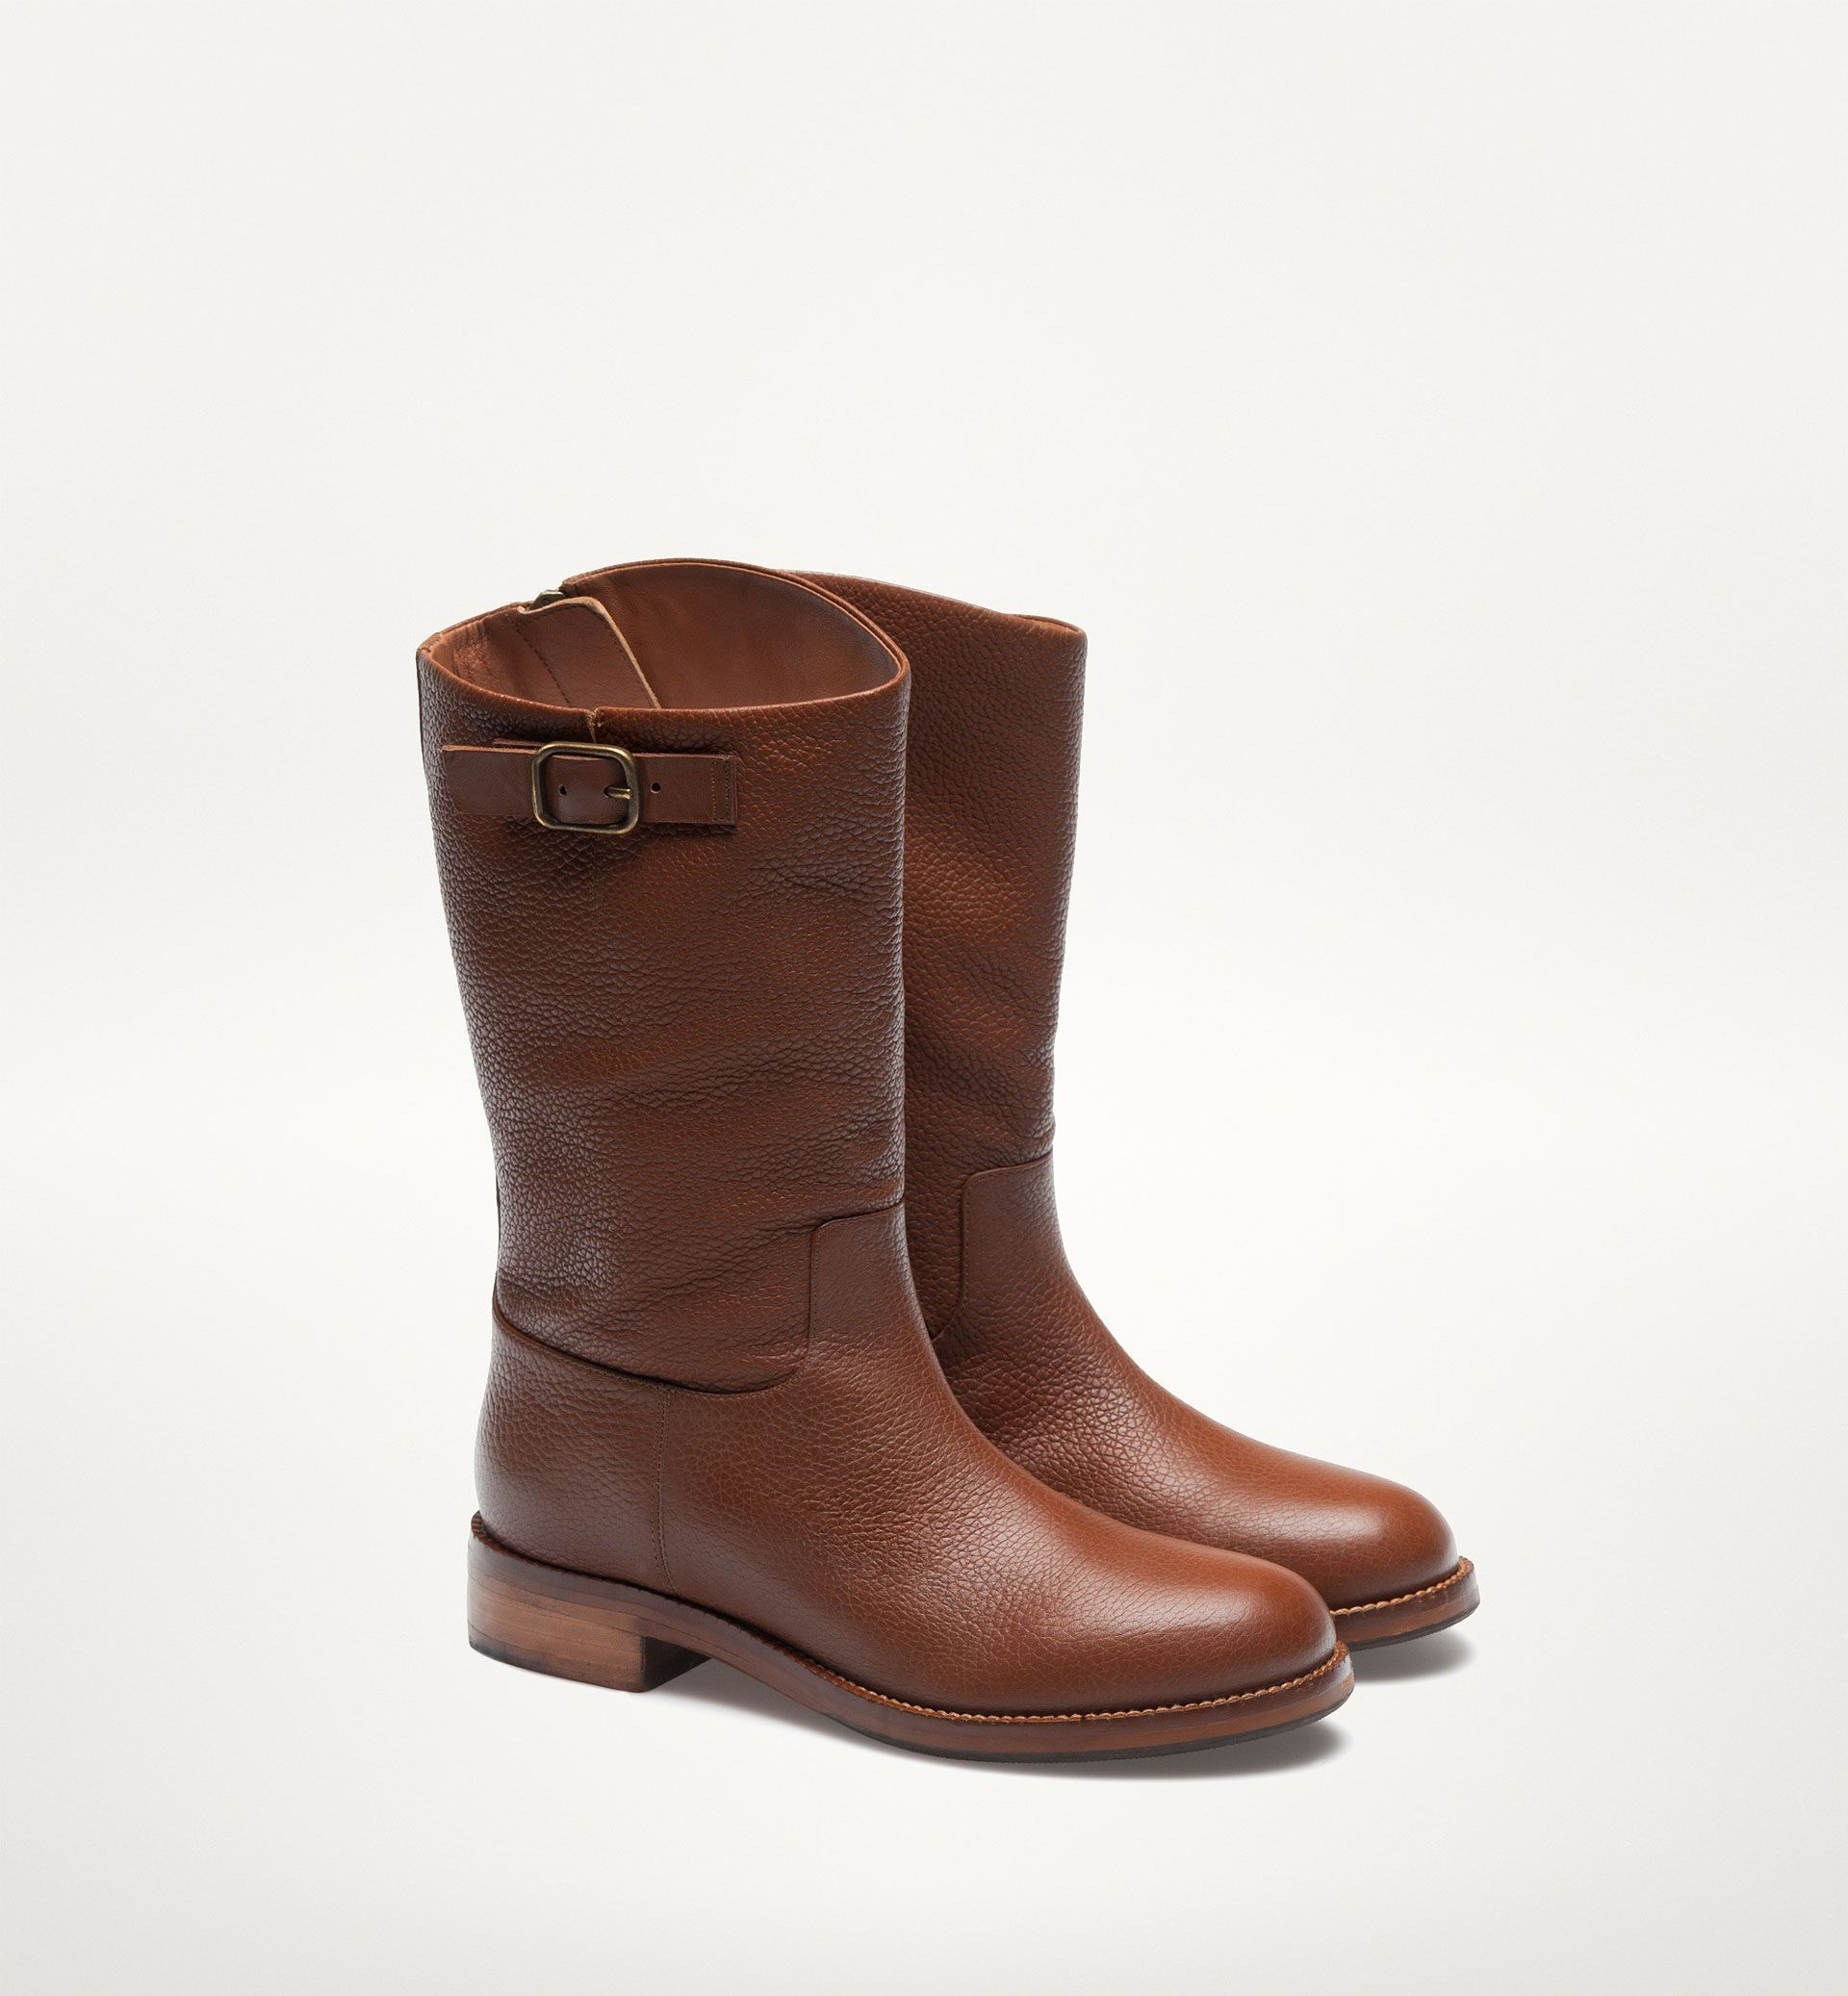 7ec534b4b3e BROWN MID-CALF BIKER BOOTS | That's me! in 2019 | Boots, Shoes ...